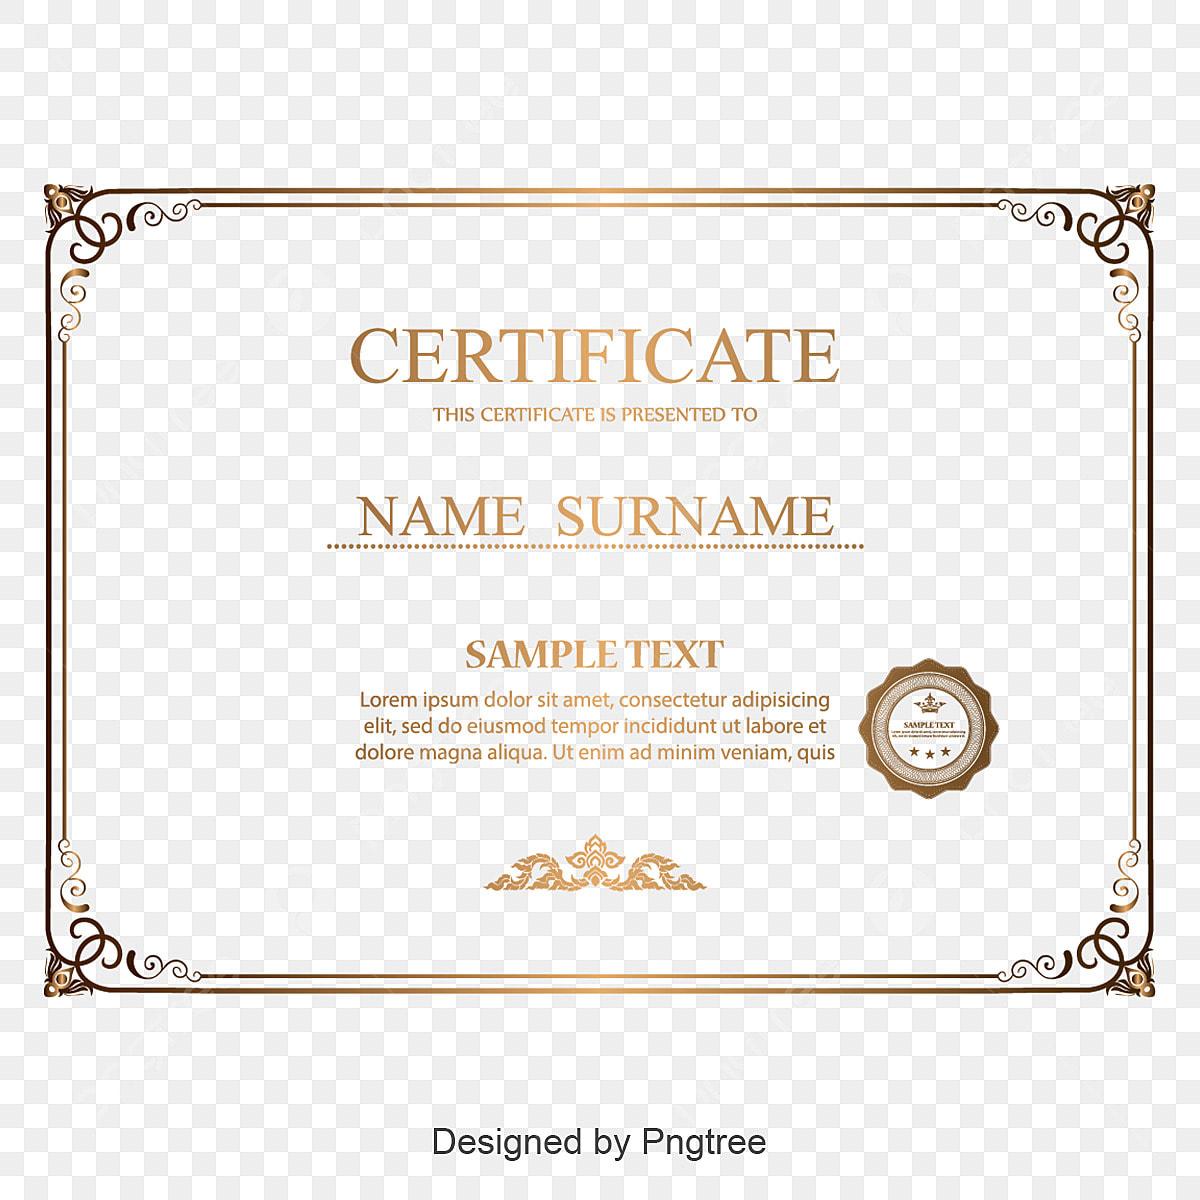 certificat de texture de bordure rouge des certificats